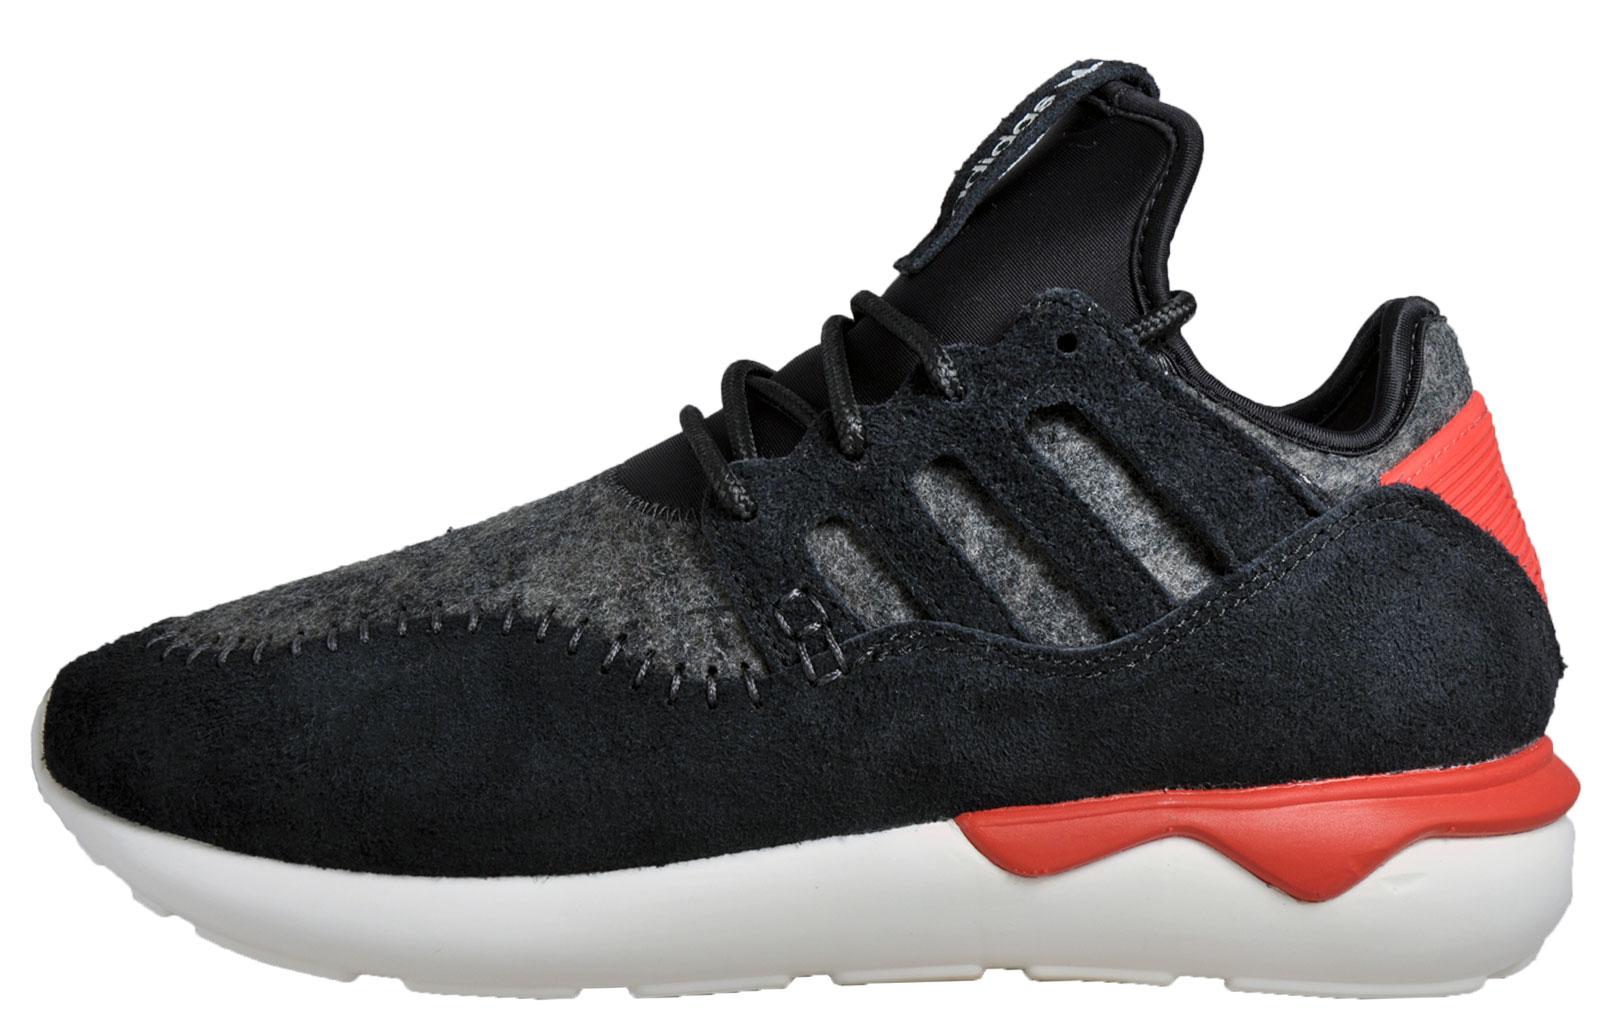 the best attitude 5d642 013d7 get adidas originals tubular moc runner mens suede gym running casual  trainers black 492ad 49c09